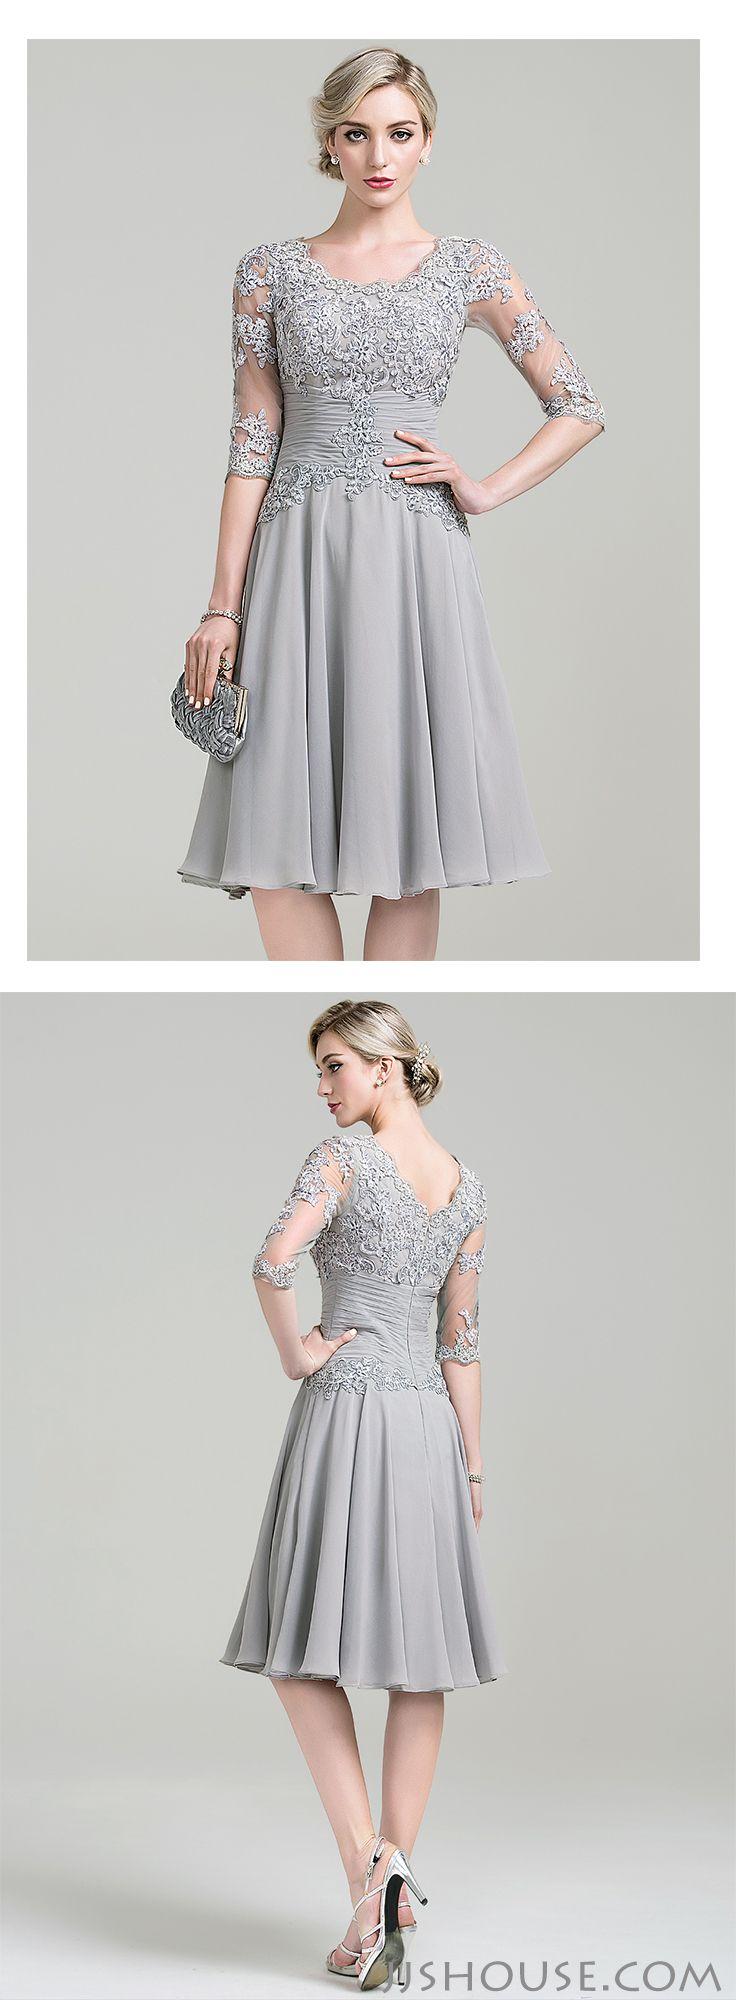 Cocktail dress 2017 venza